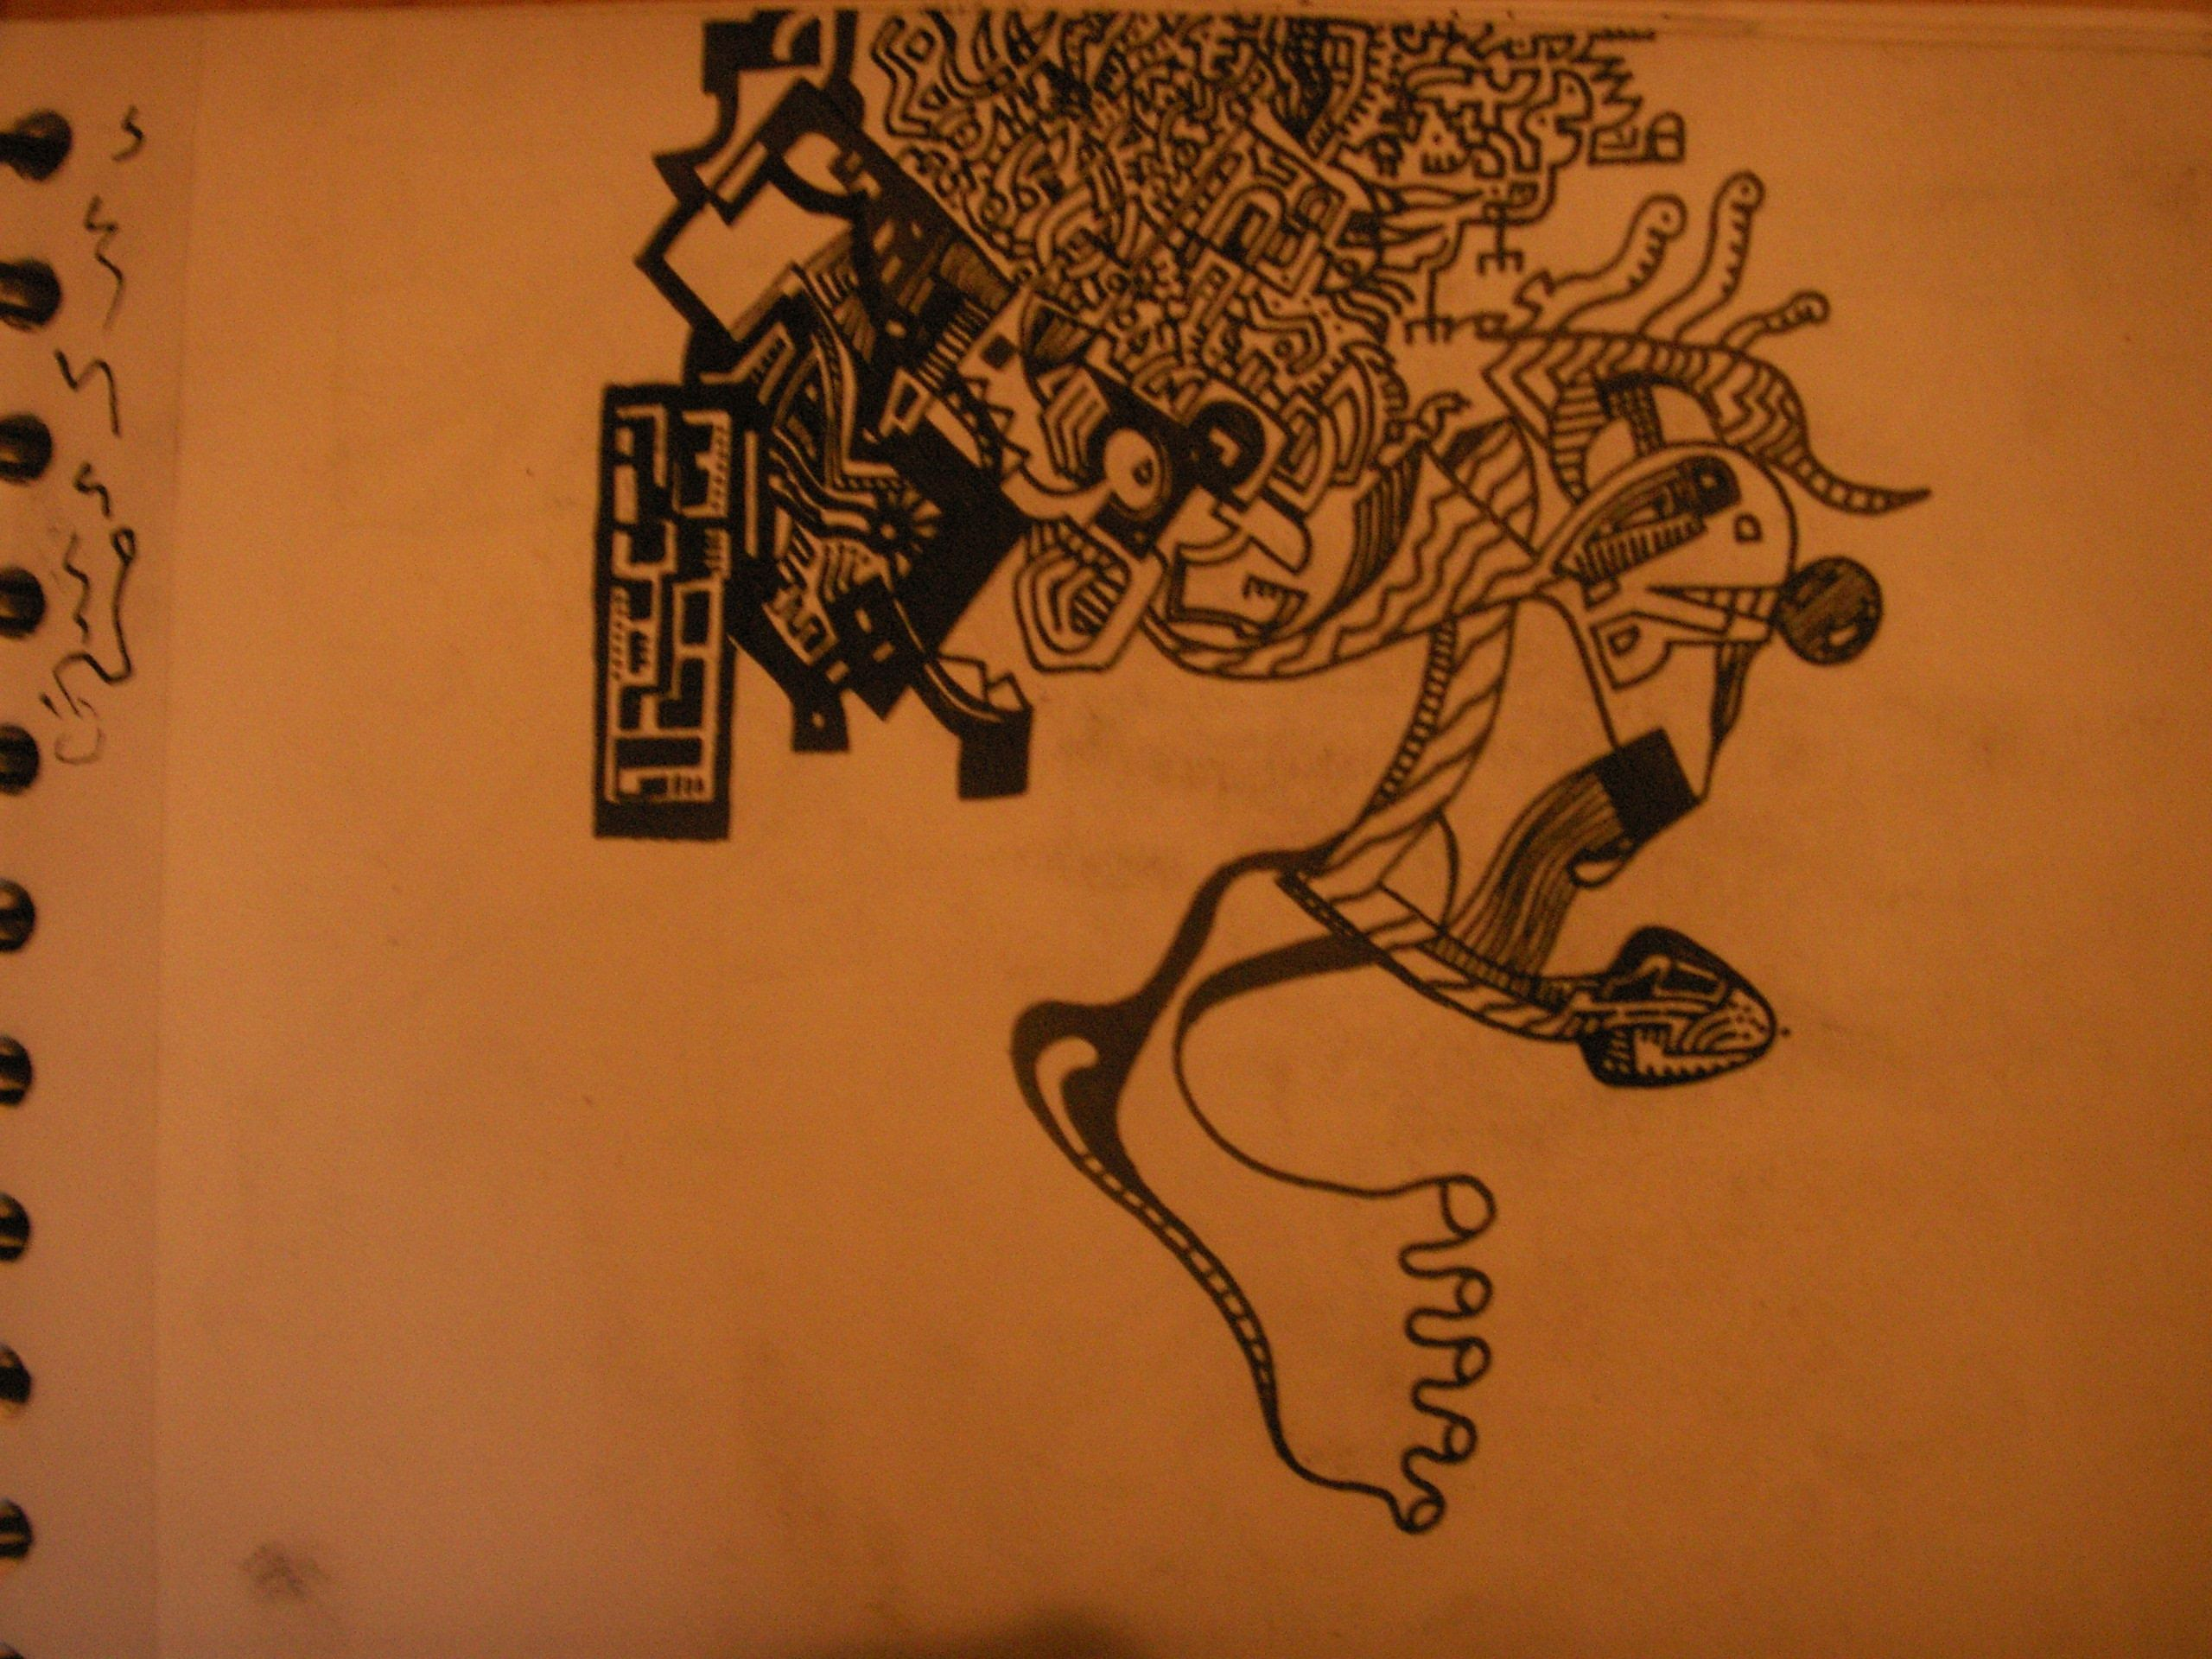 http://www.pinterest.com/tetarbilbo/ink/